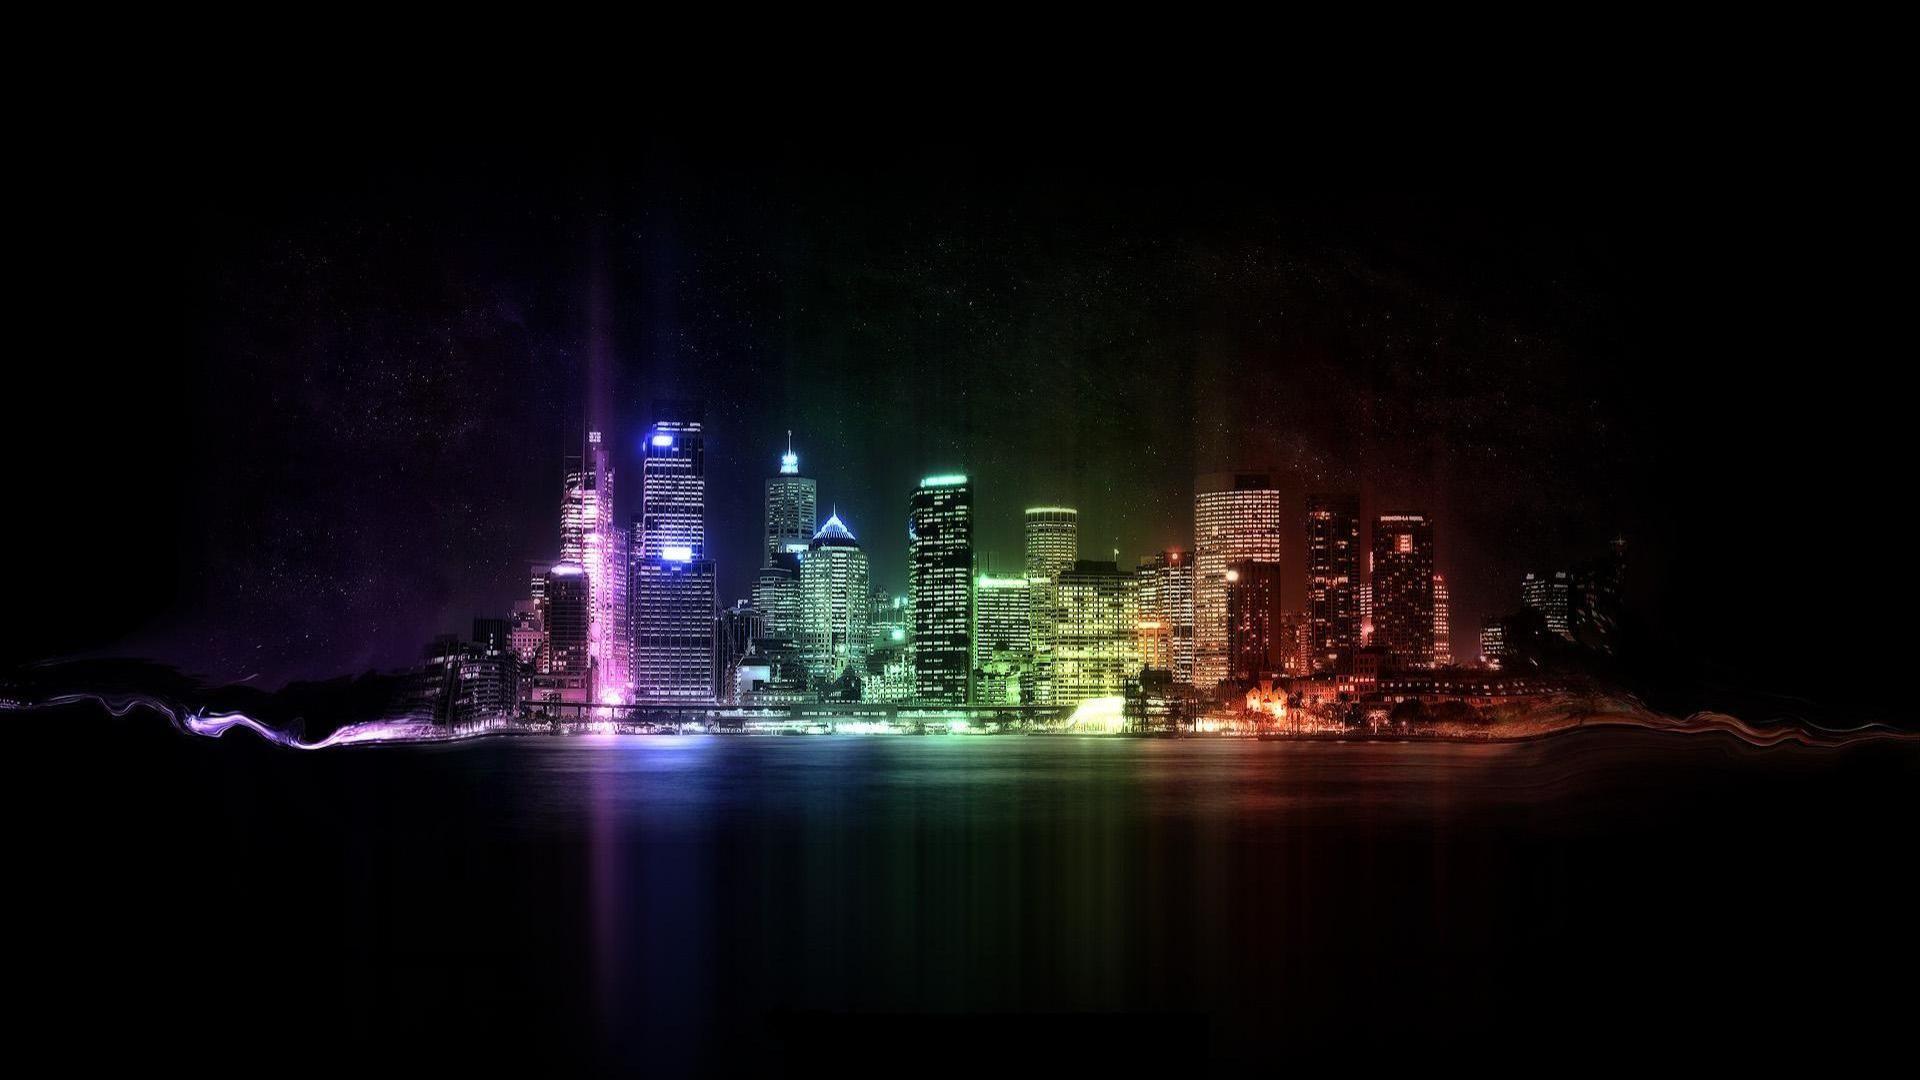 Really Cool Desktop Wallpapers Best Wallpaper Hd City Wallpaper Cool Backgrounds Rainbow City